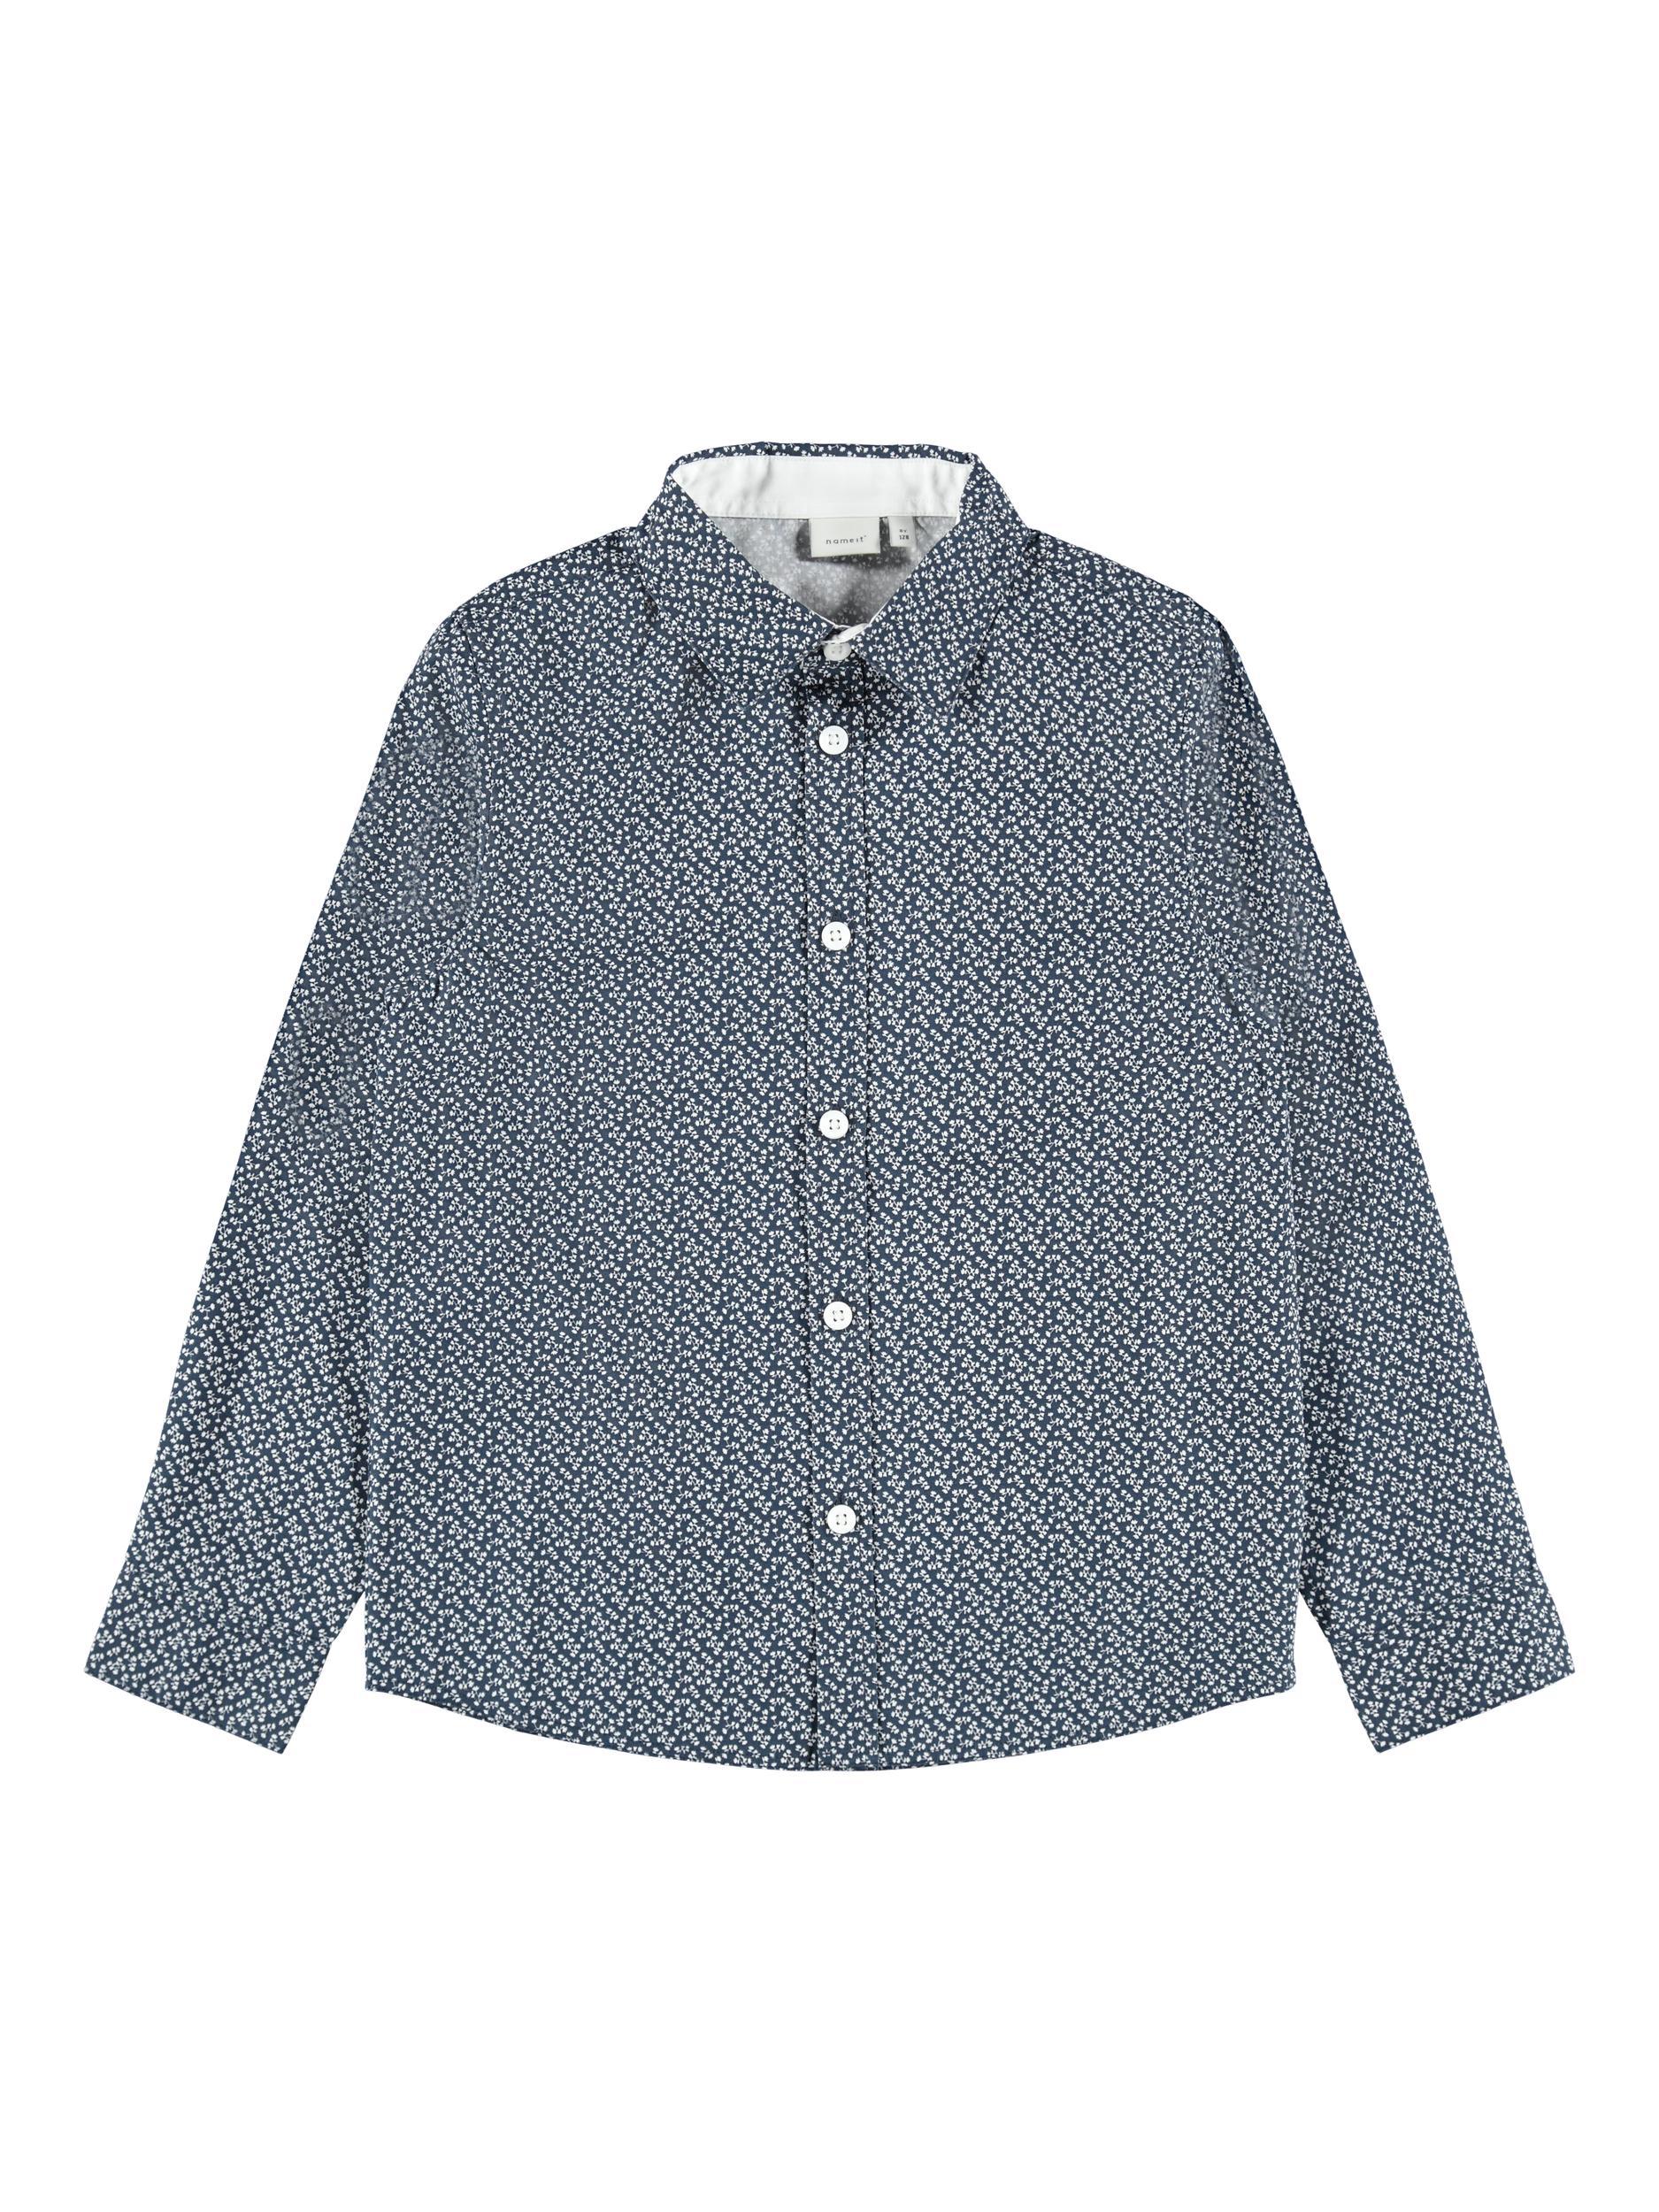 Name It Raki skjorte, Dark Sapphire, 122-128